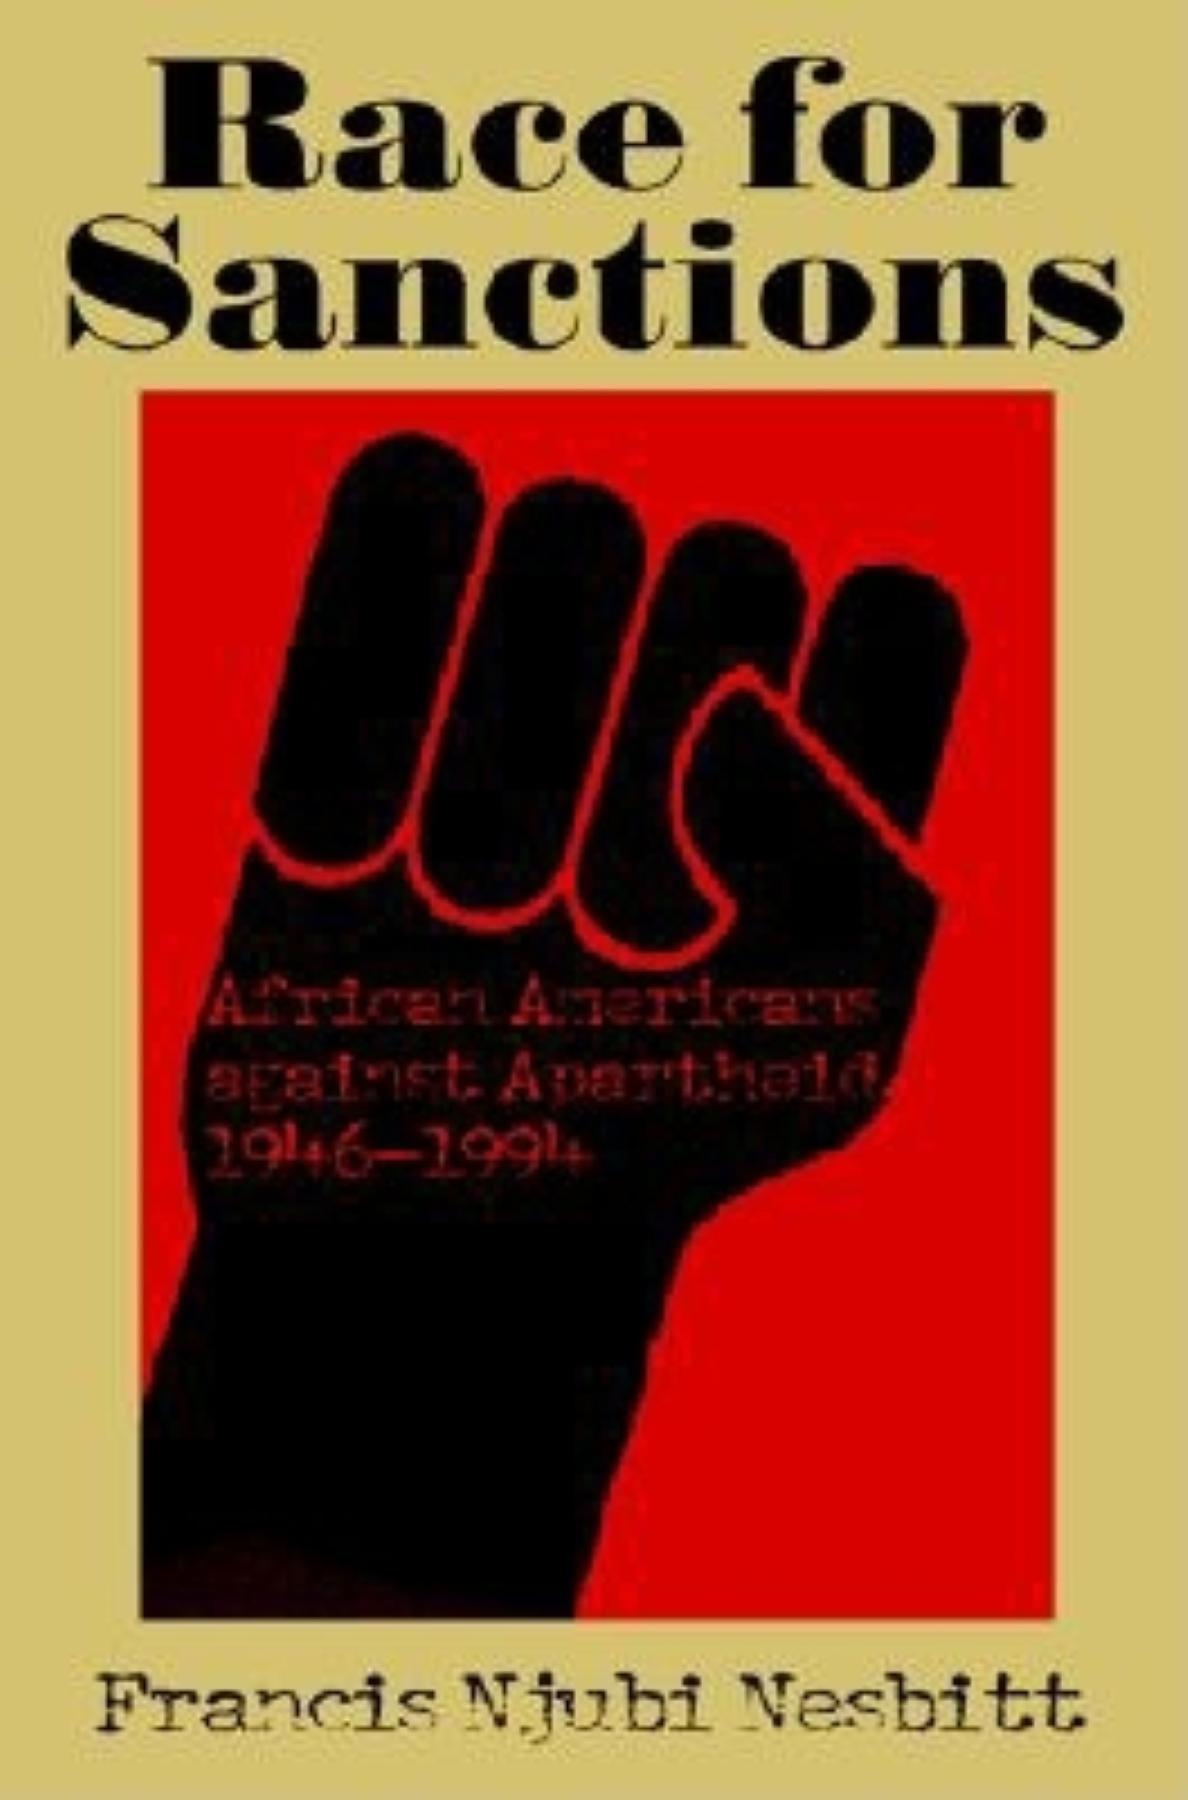 Download Race for Sanctions: African Americans against Apartheid, 1946-1994 (Blacks in the Diaspora) pdf epub